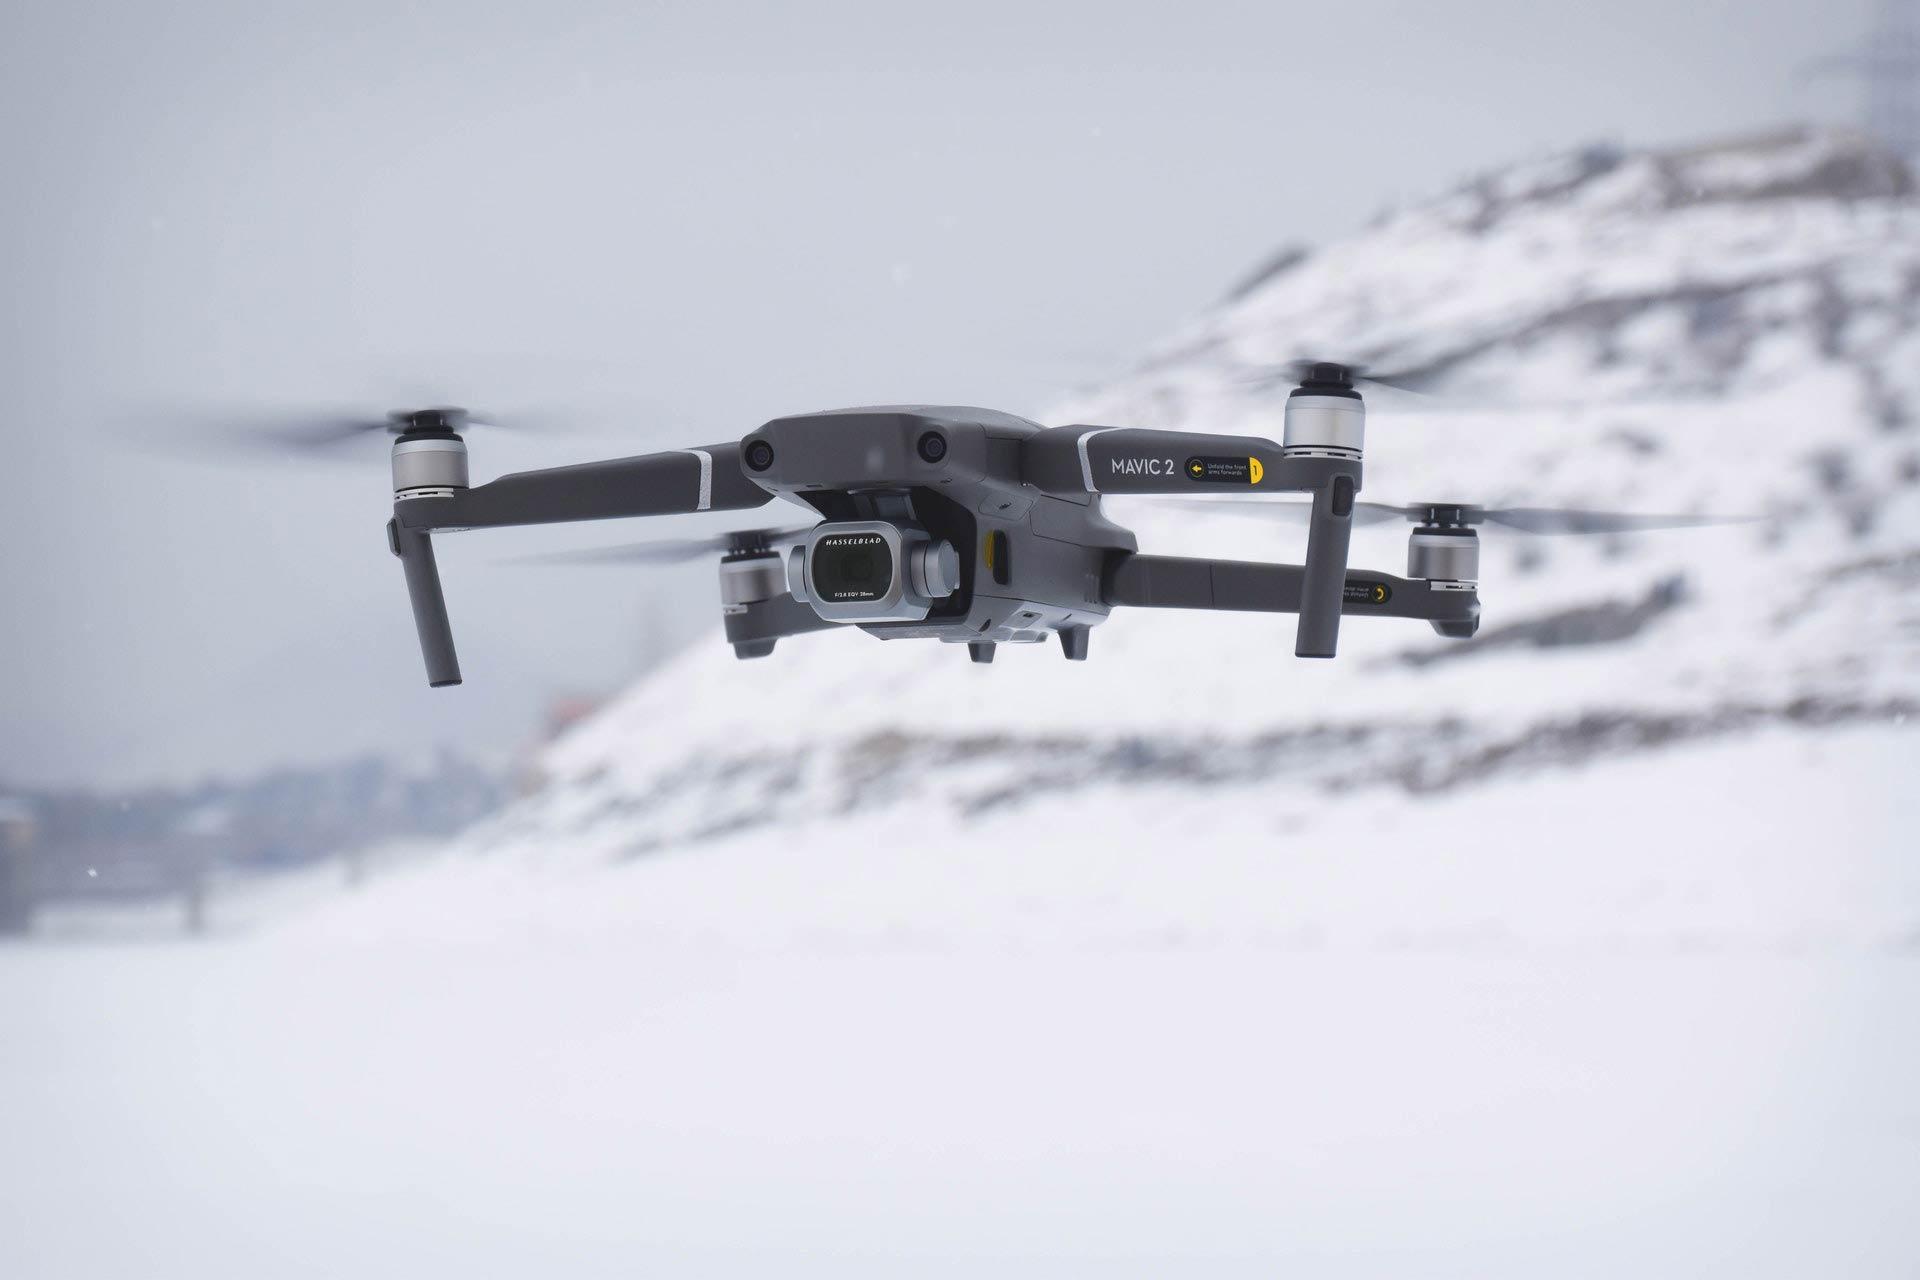 gray-dji-mavic-drone-1852984